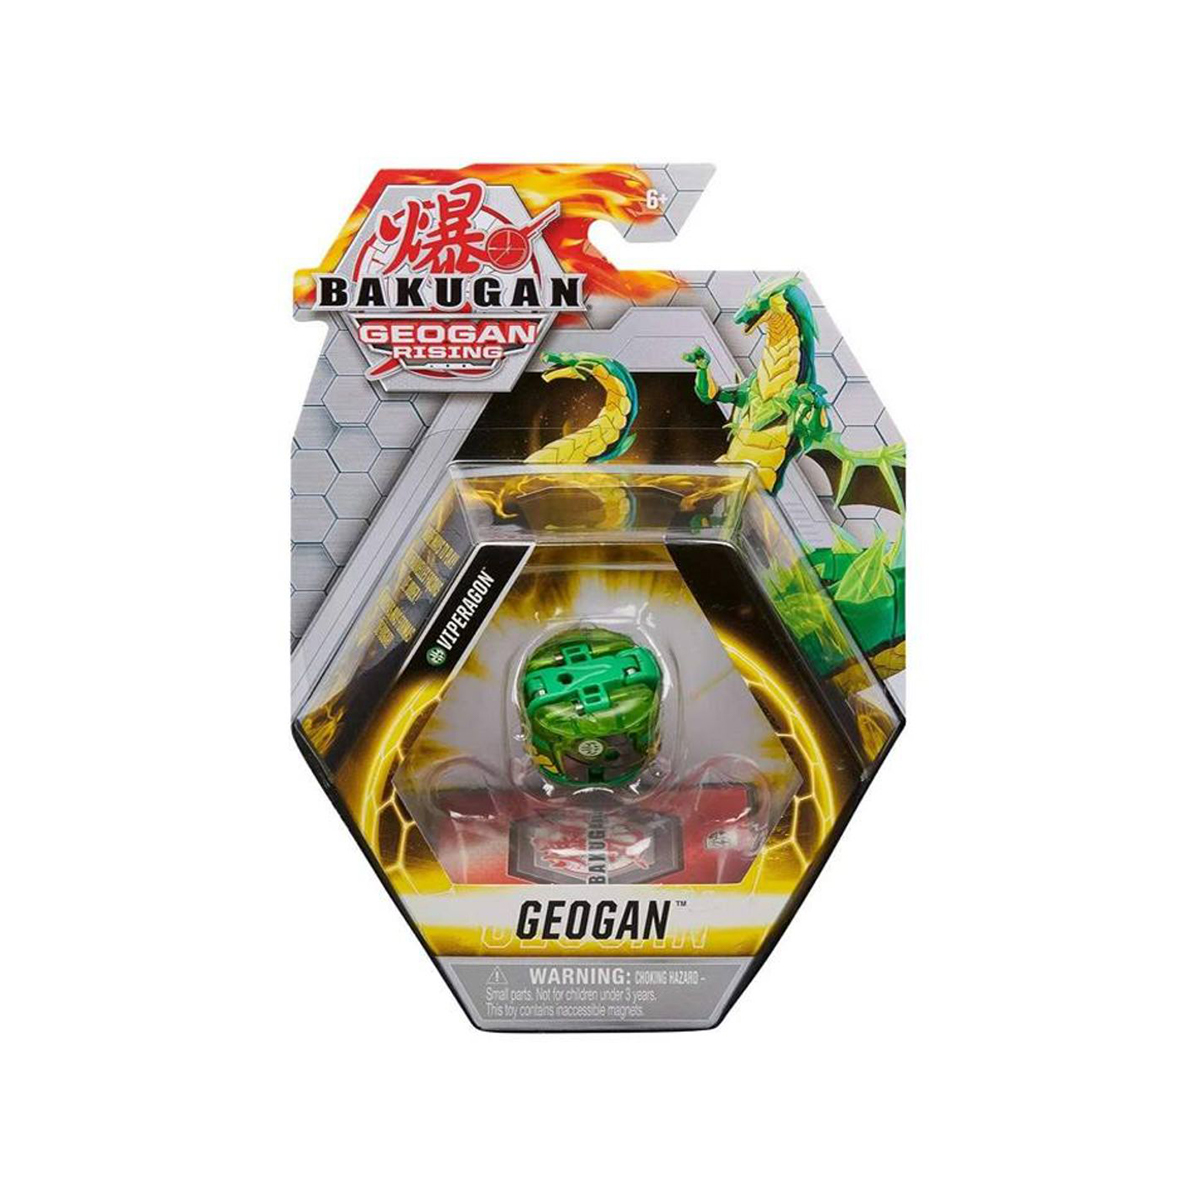 Figurina Viperagon, Bakugan, Geogan Rising, 20129003